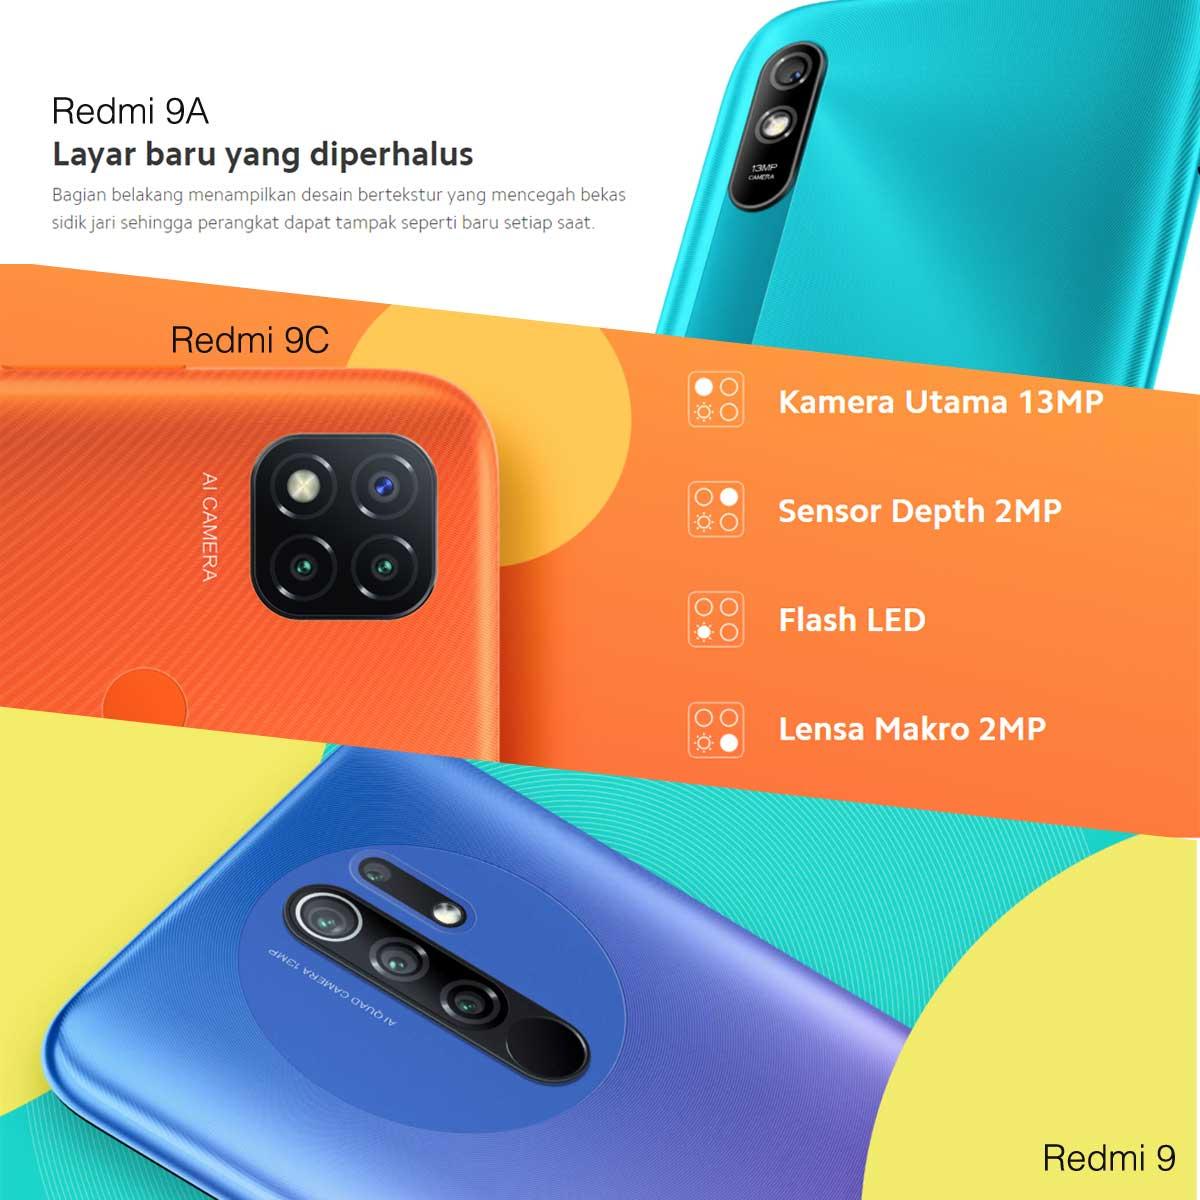 perbandingan-kamera-redmi-9a-redmi-9c-redmi-9